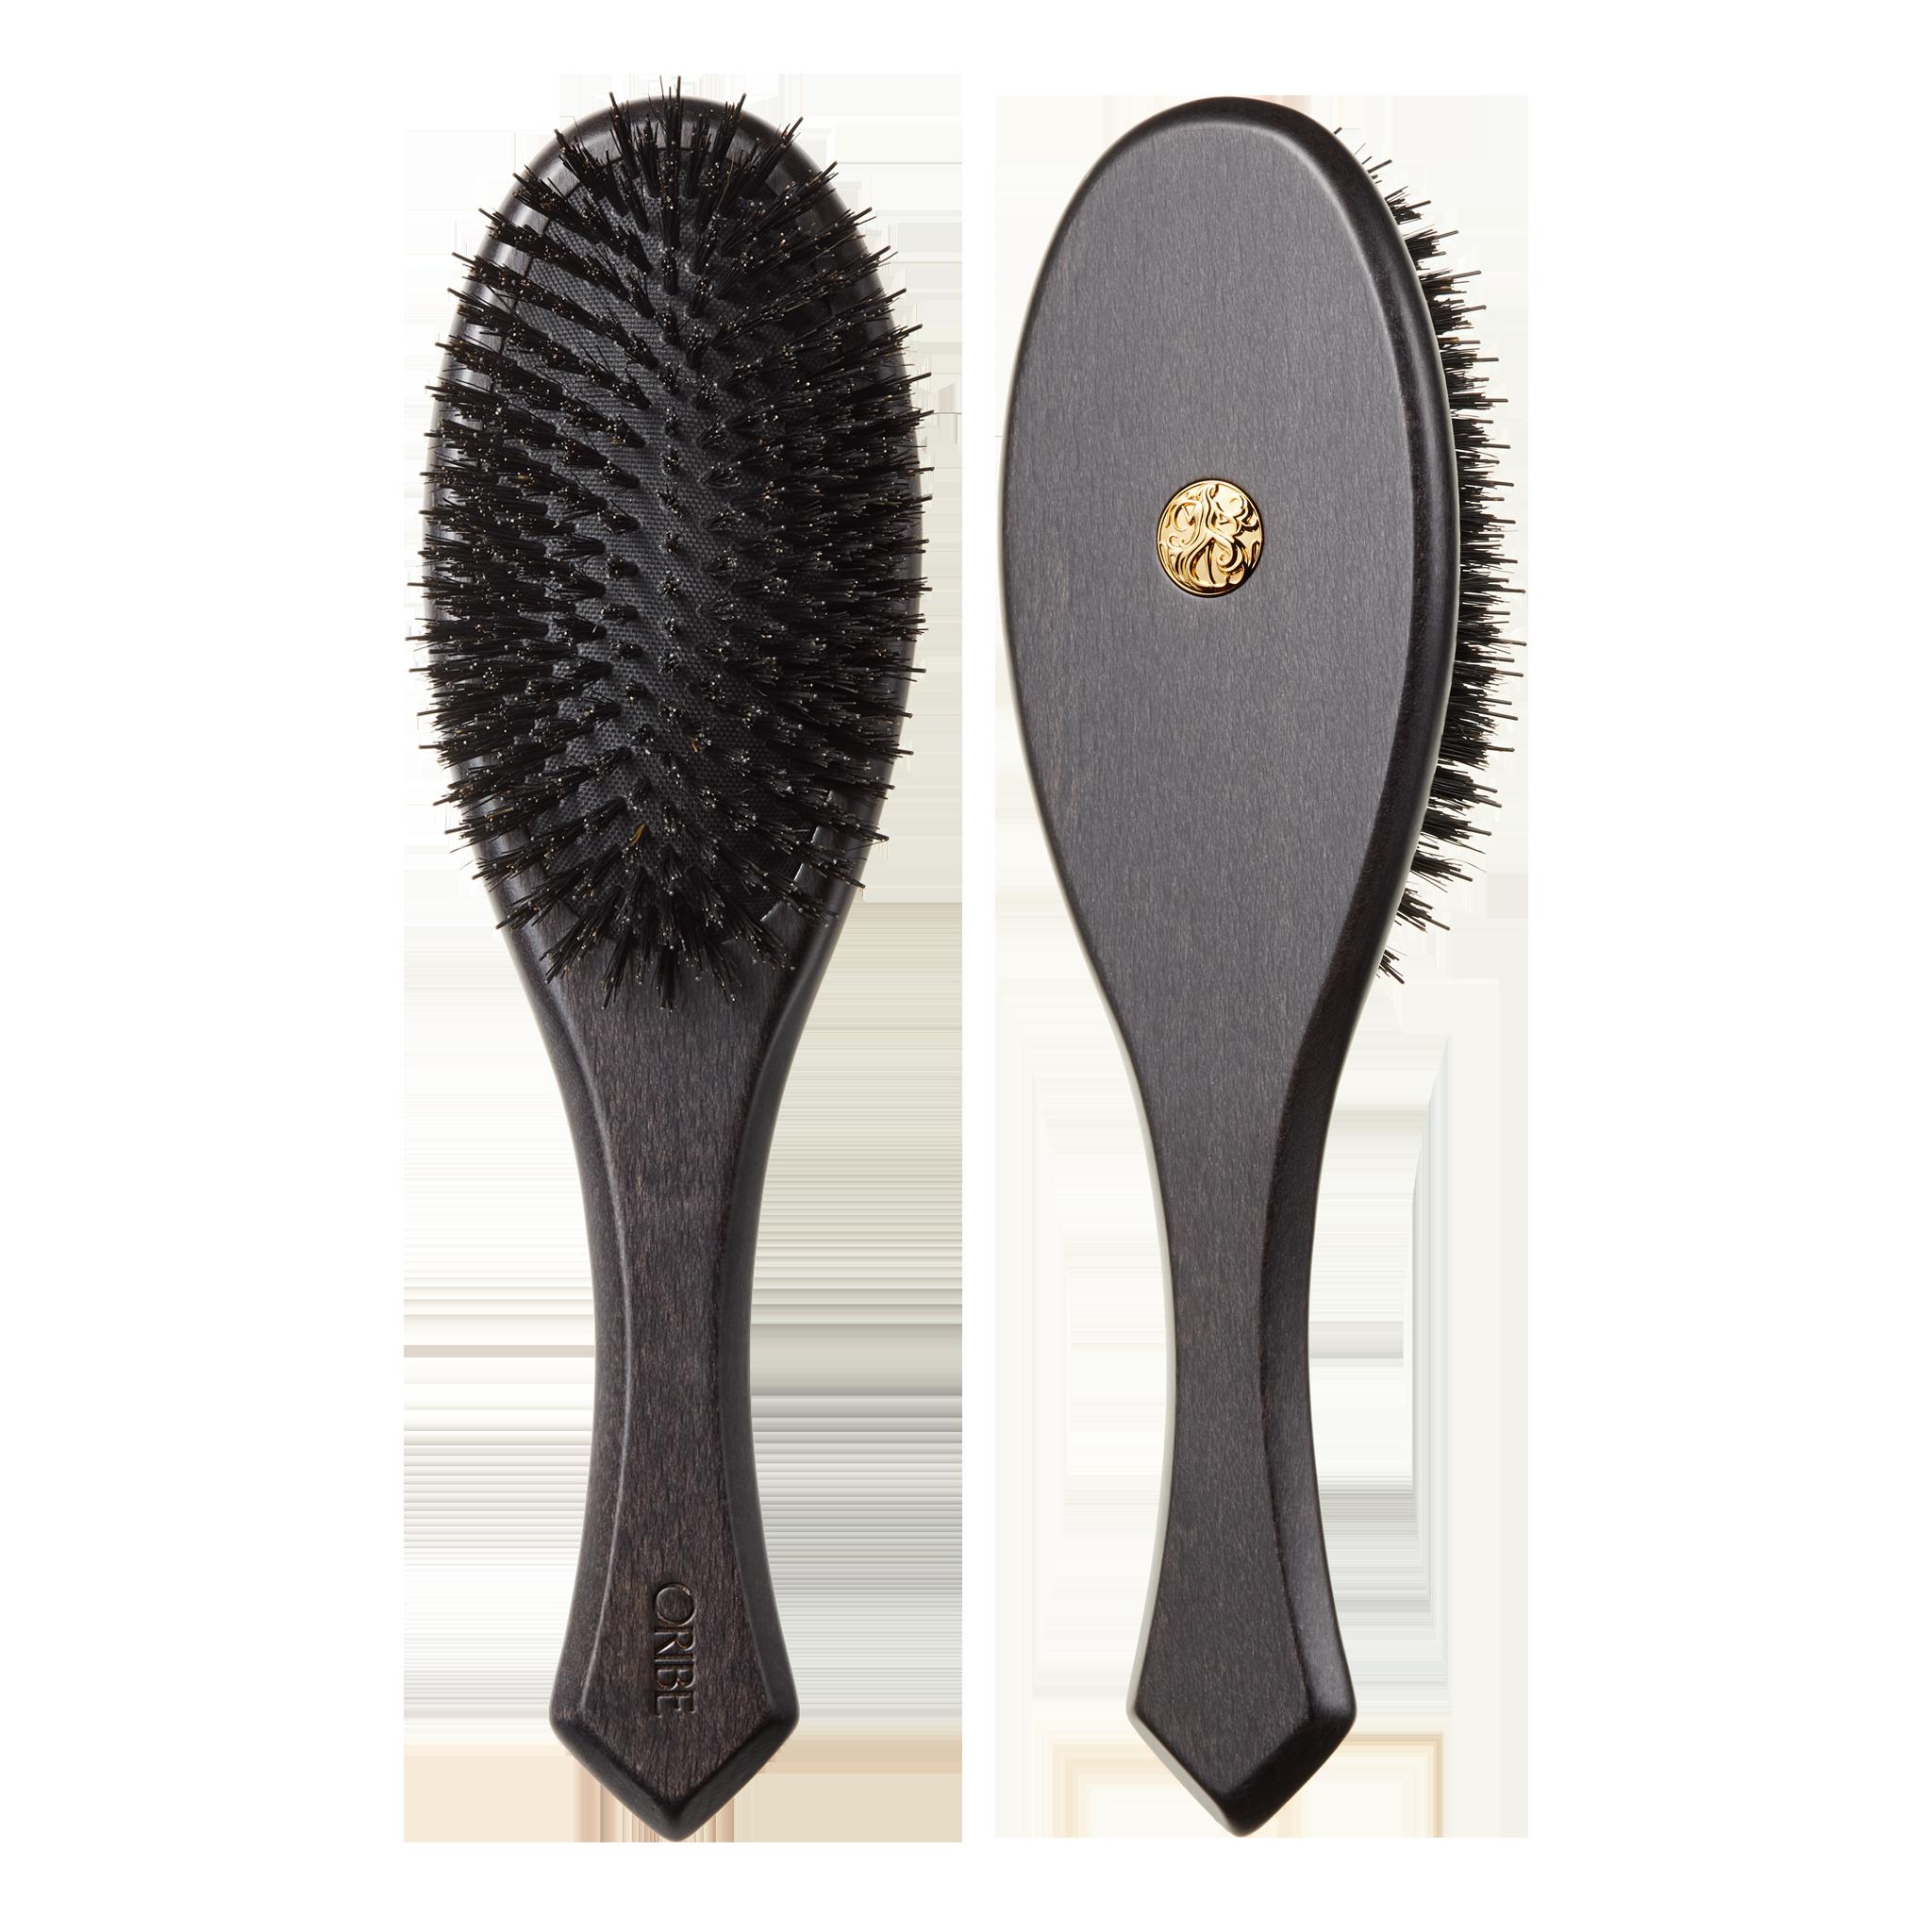 Flat Brush - Mixed Bristle